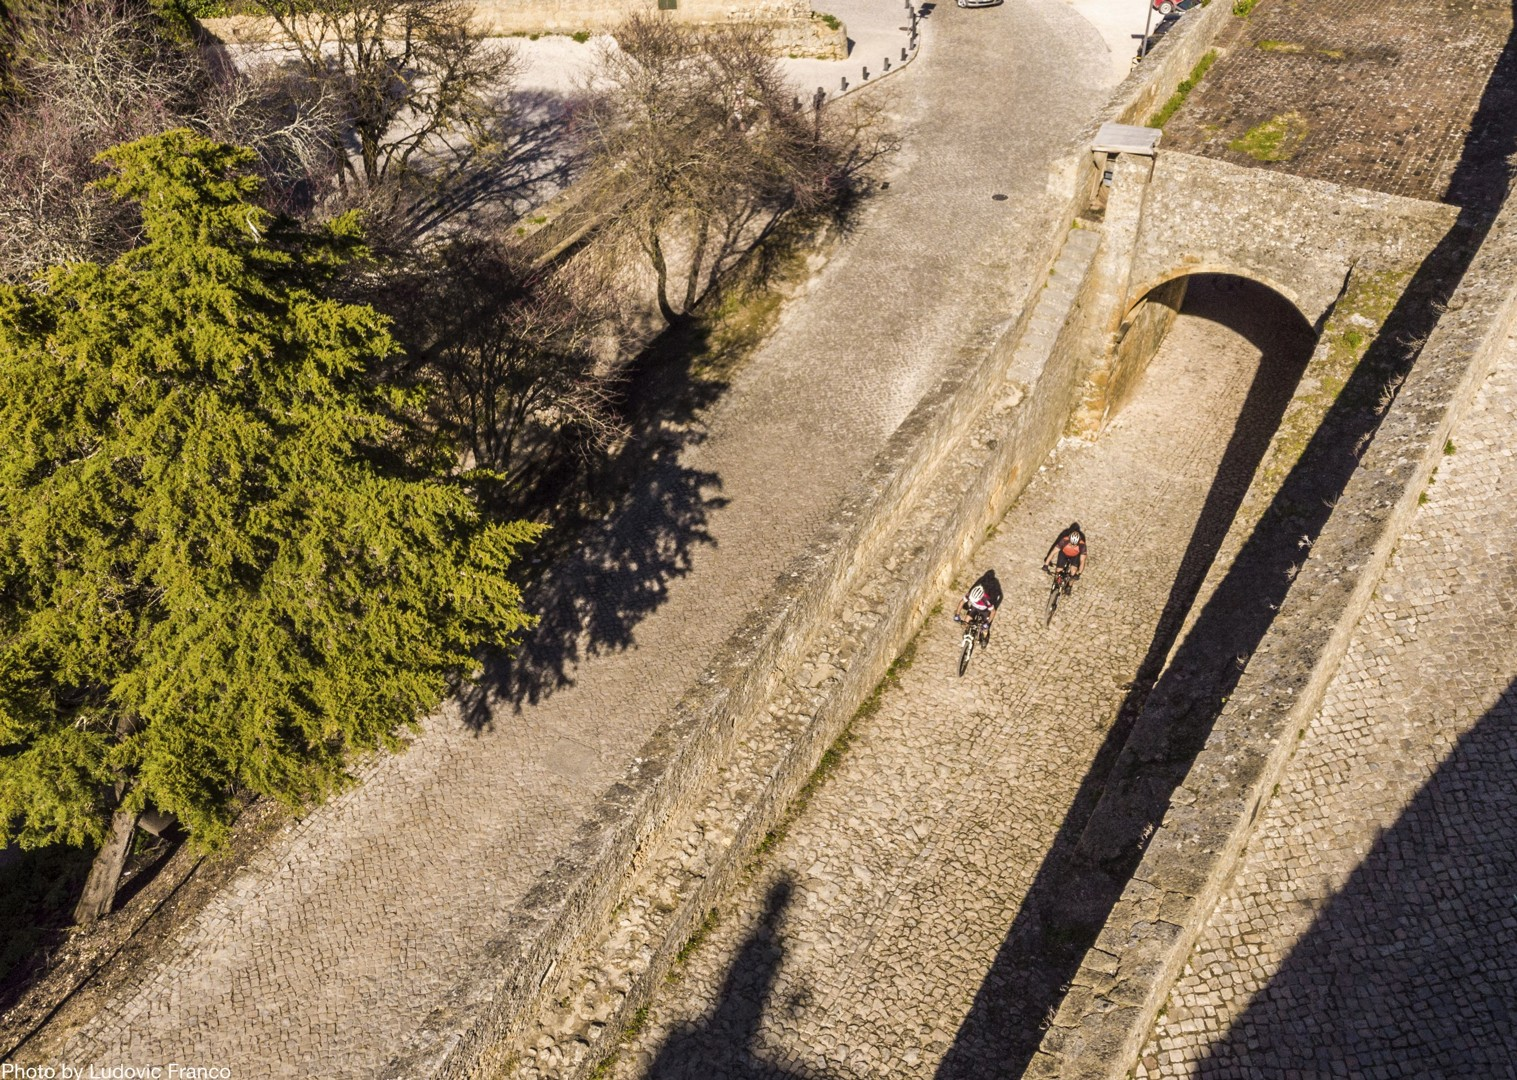 local-villages-cycling-holiday-on-atlantic-coast-portugal.jpg - Portugal - Atlantic Trails - Mountain Biking